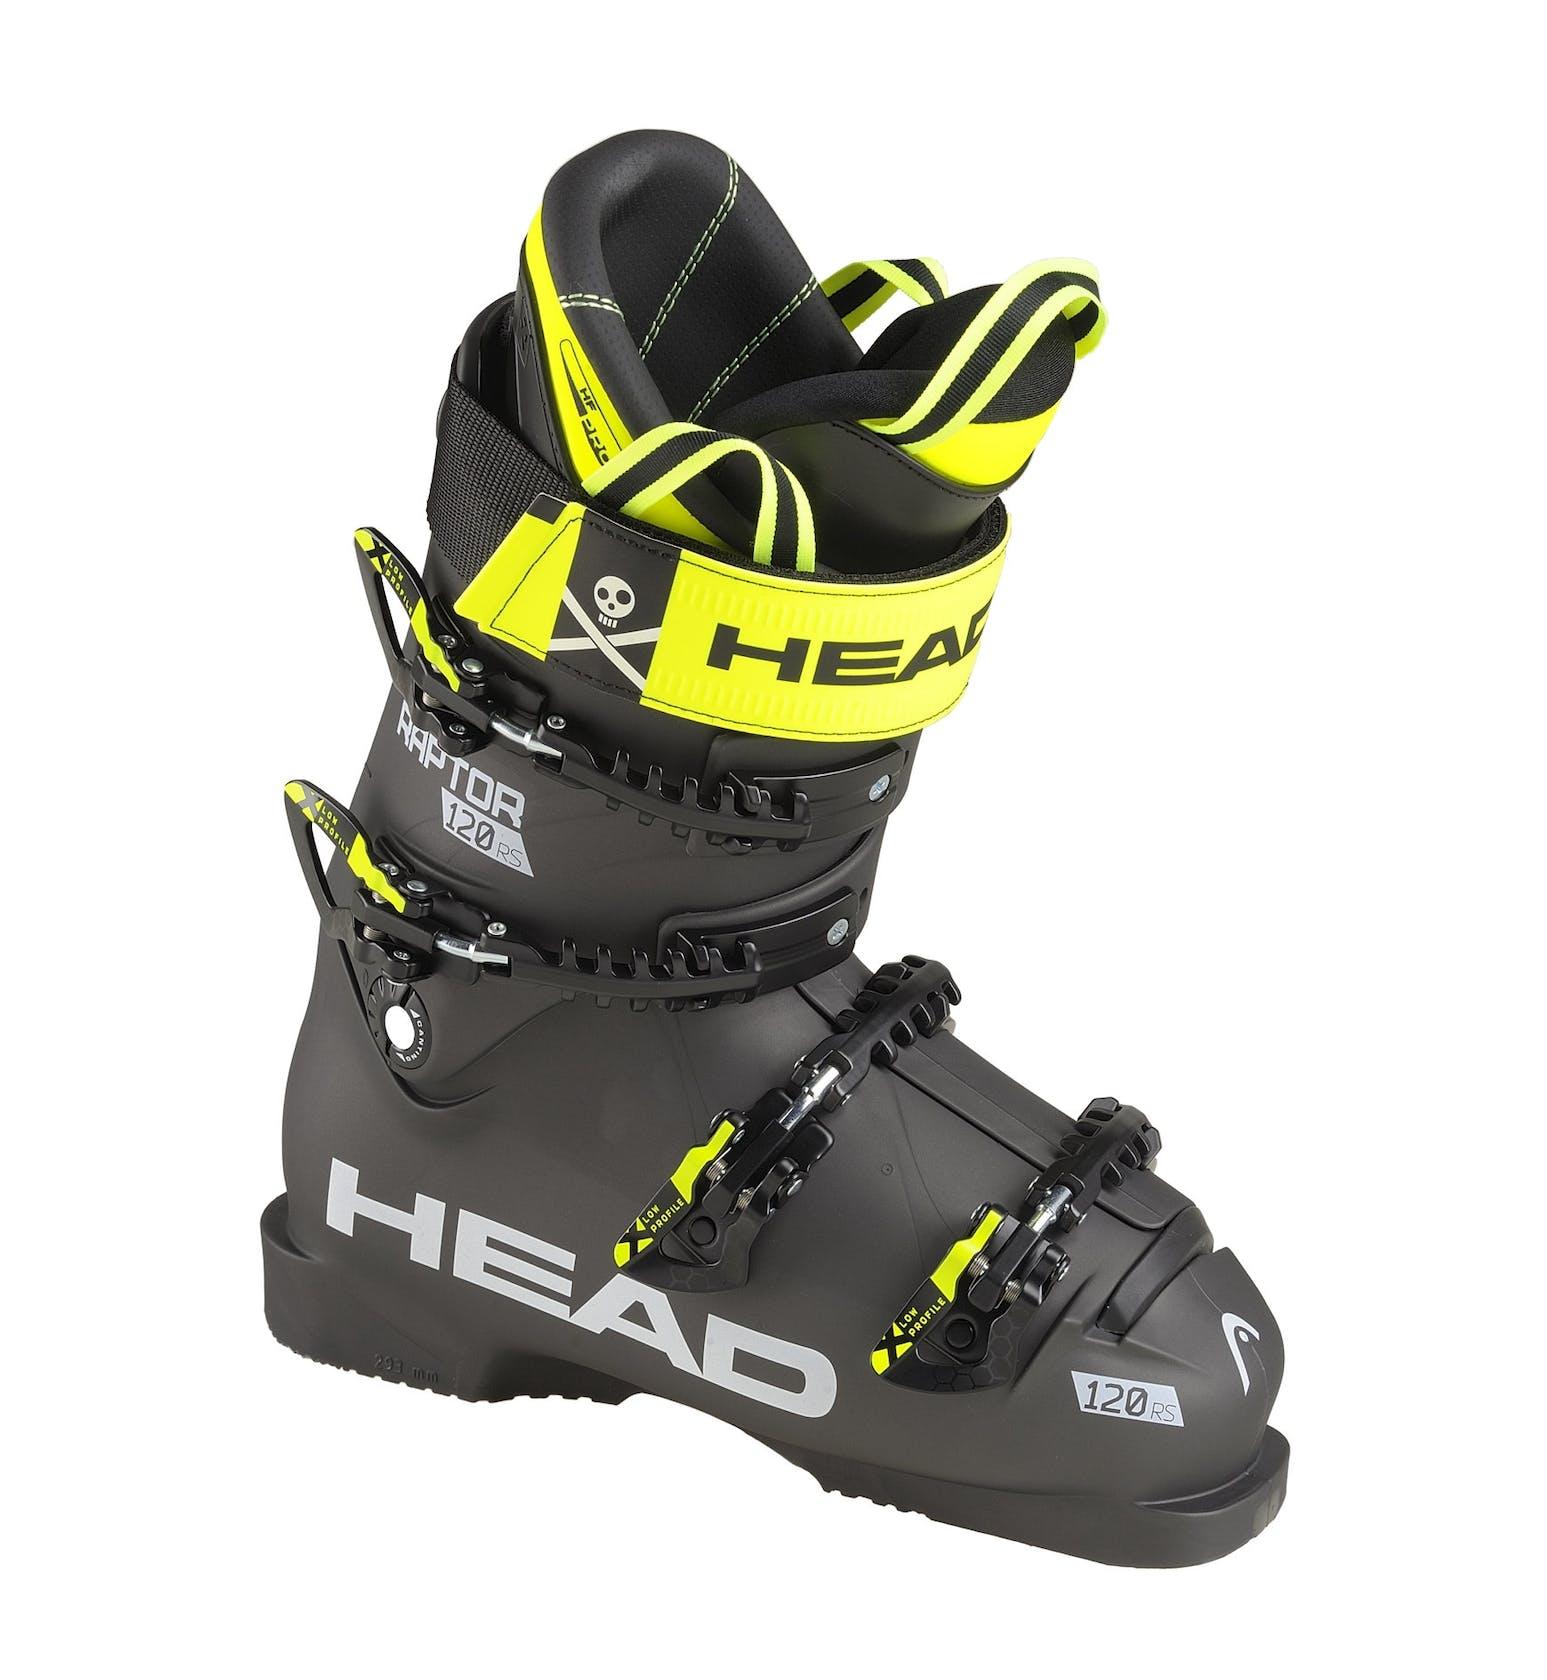 Head Raptor 120S RS - scarpone da sci alpino high performance